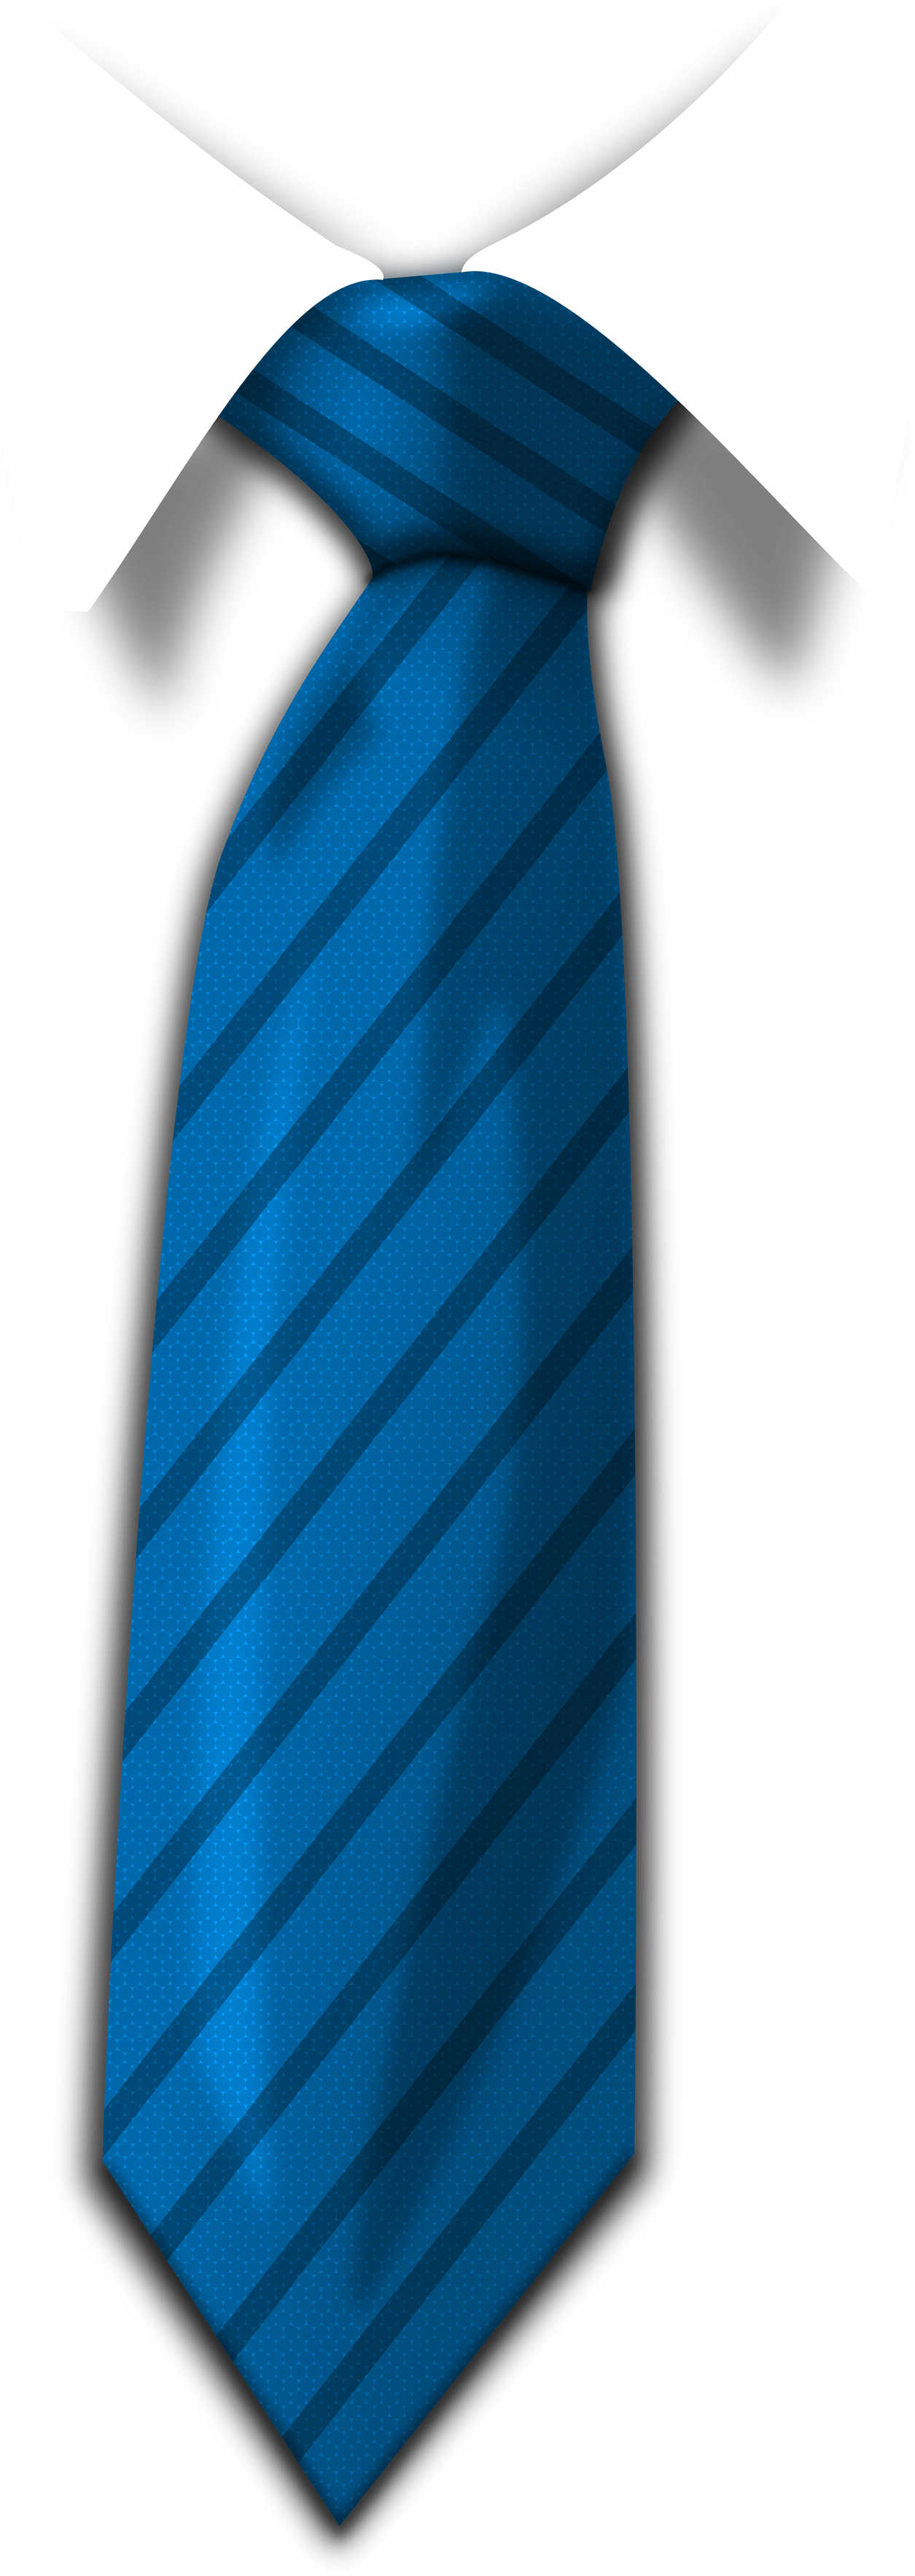 Blue Tie PNG Image